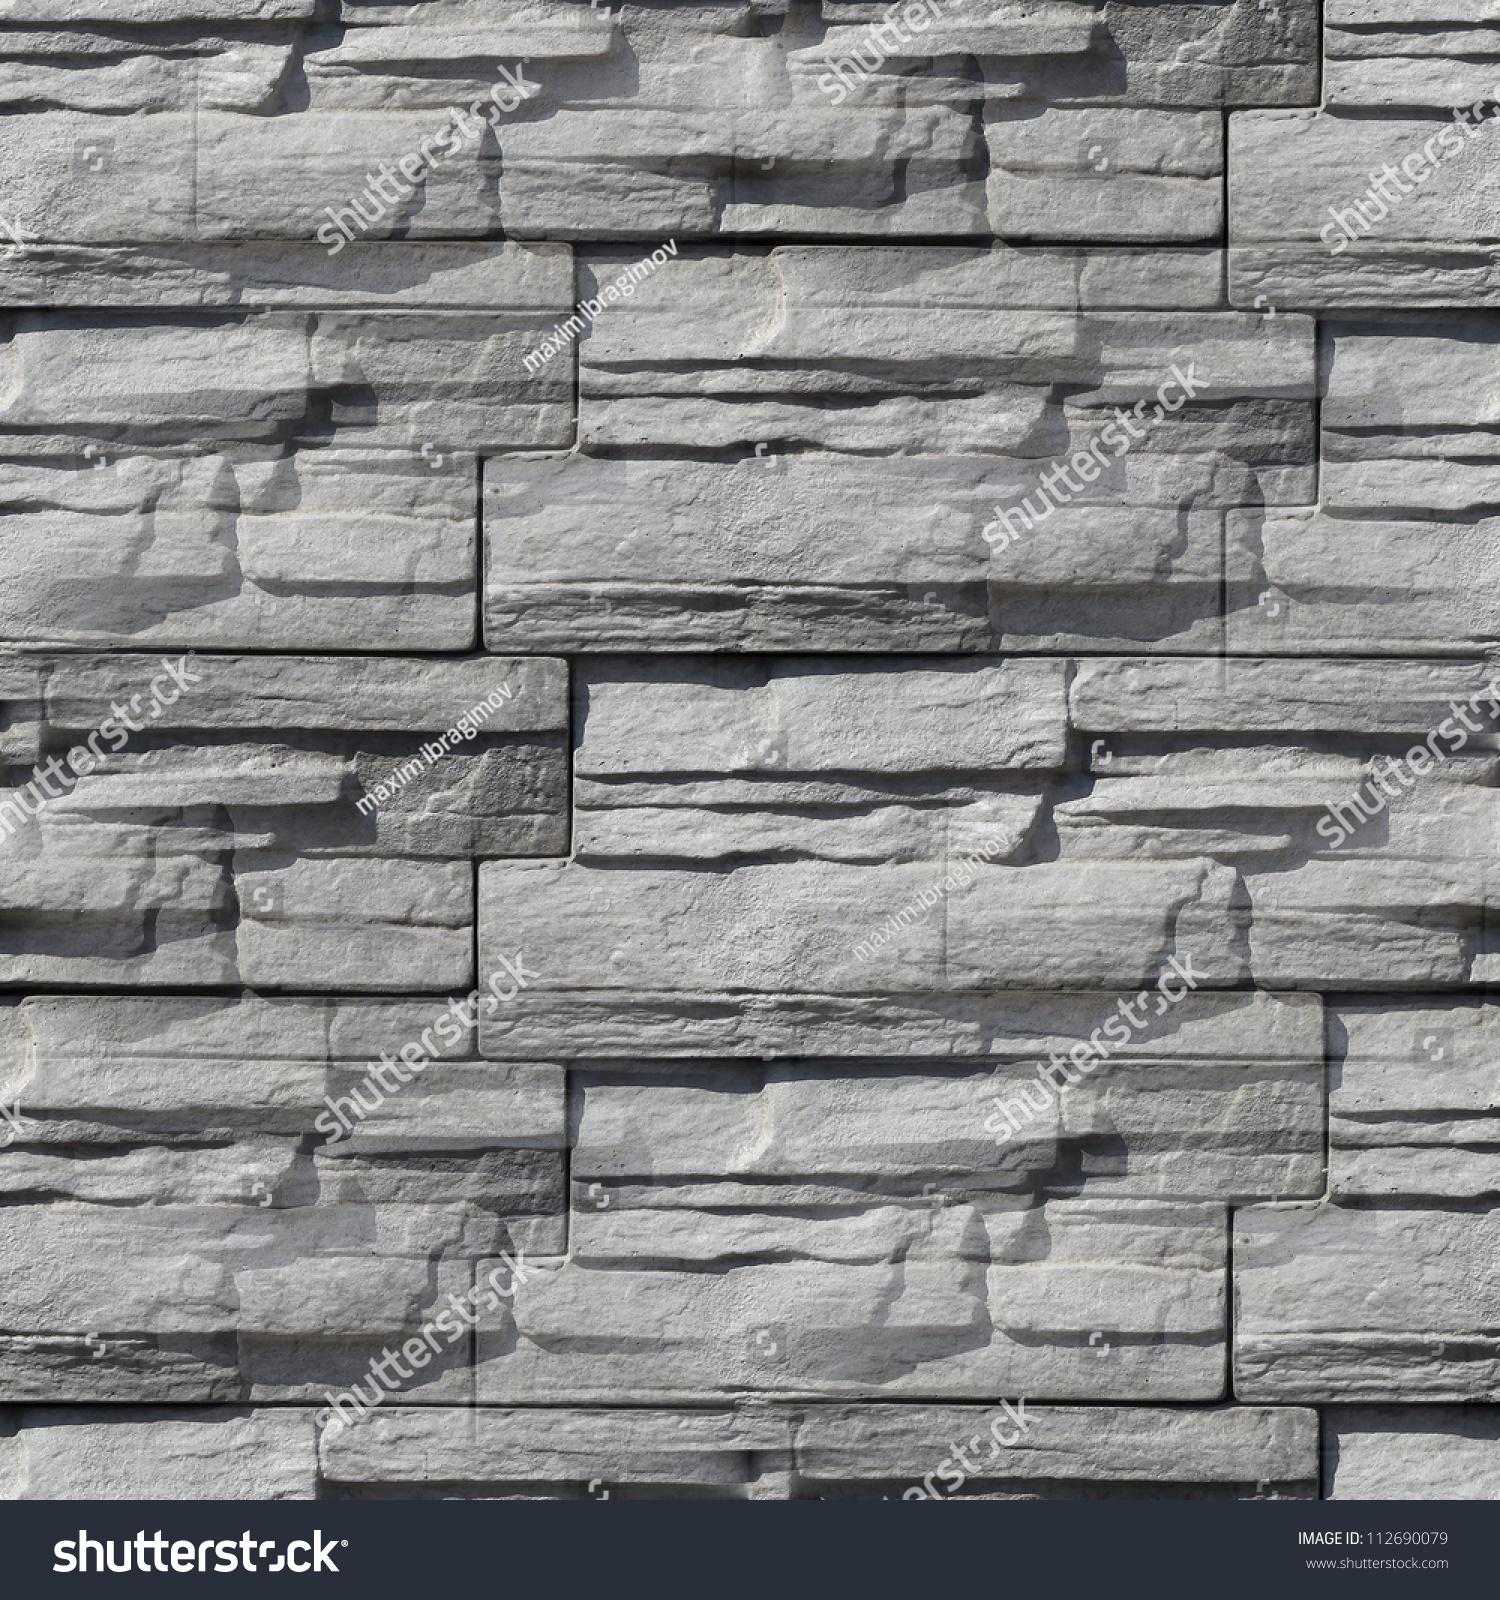 3d Wallpaper Or Wall Panel Or Wall Panels Stacked Stone Granite Stone Gray Decorative Brick Wall Stock Photo